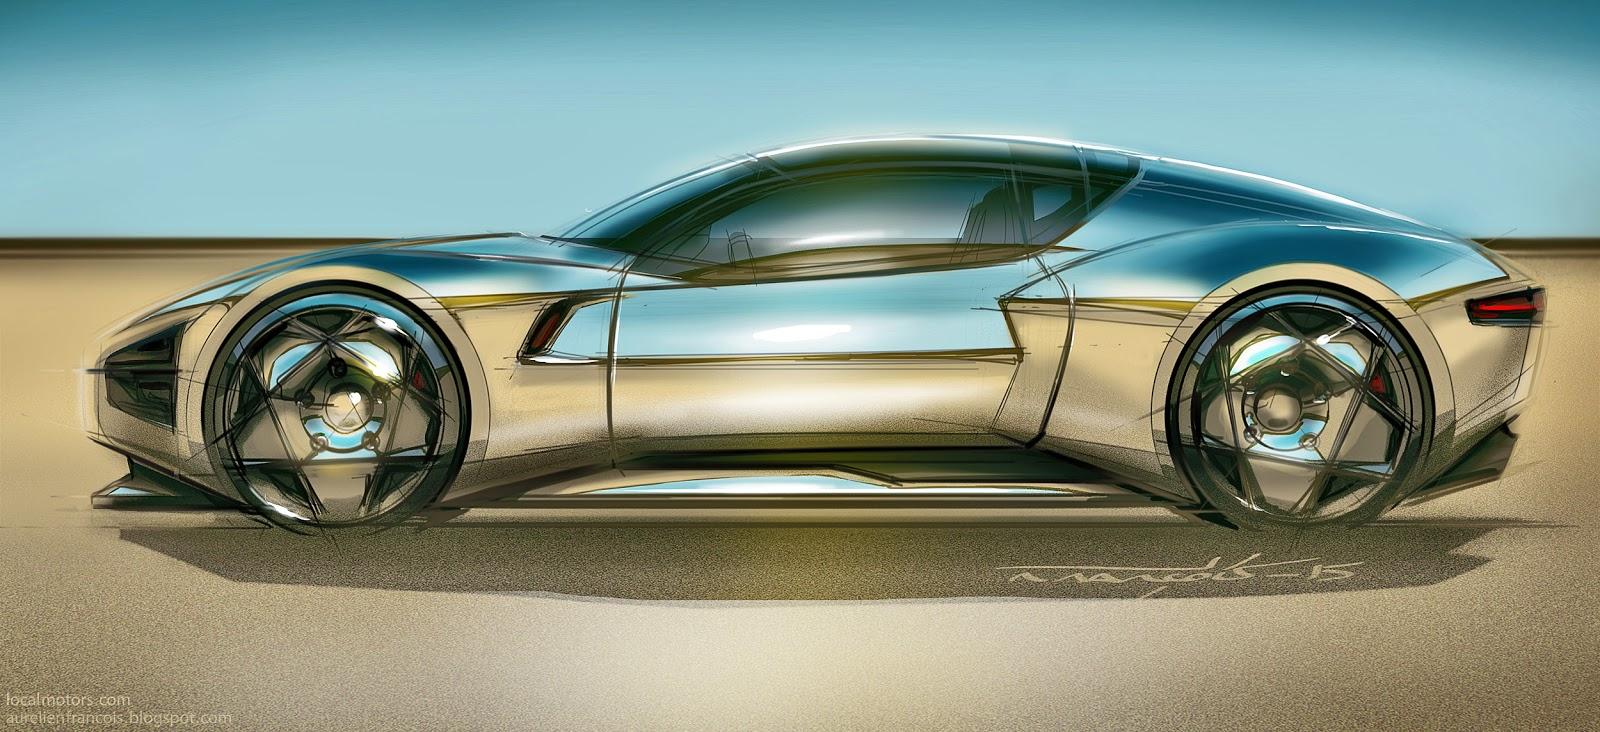 Designs By Aurel Sketchover Tutorial 6 How To Render A Chrome Car